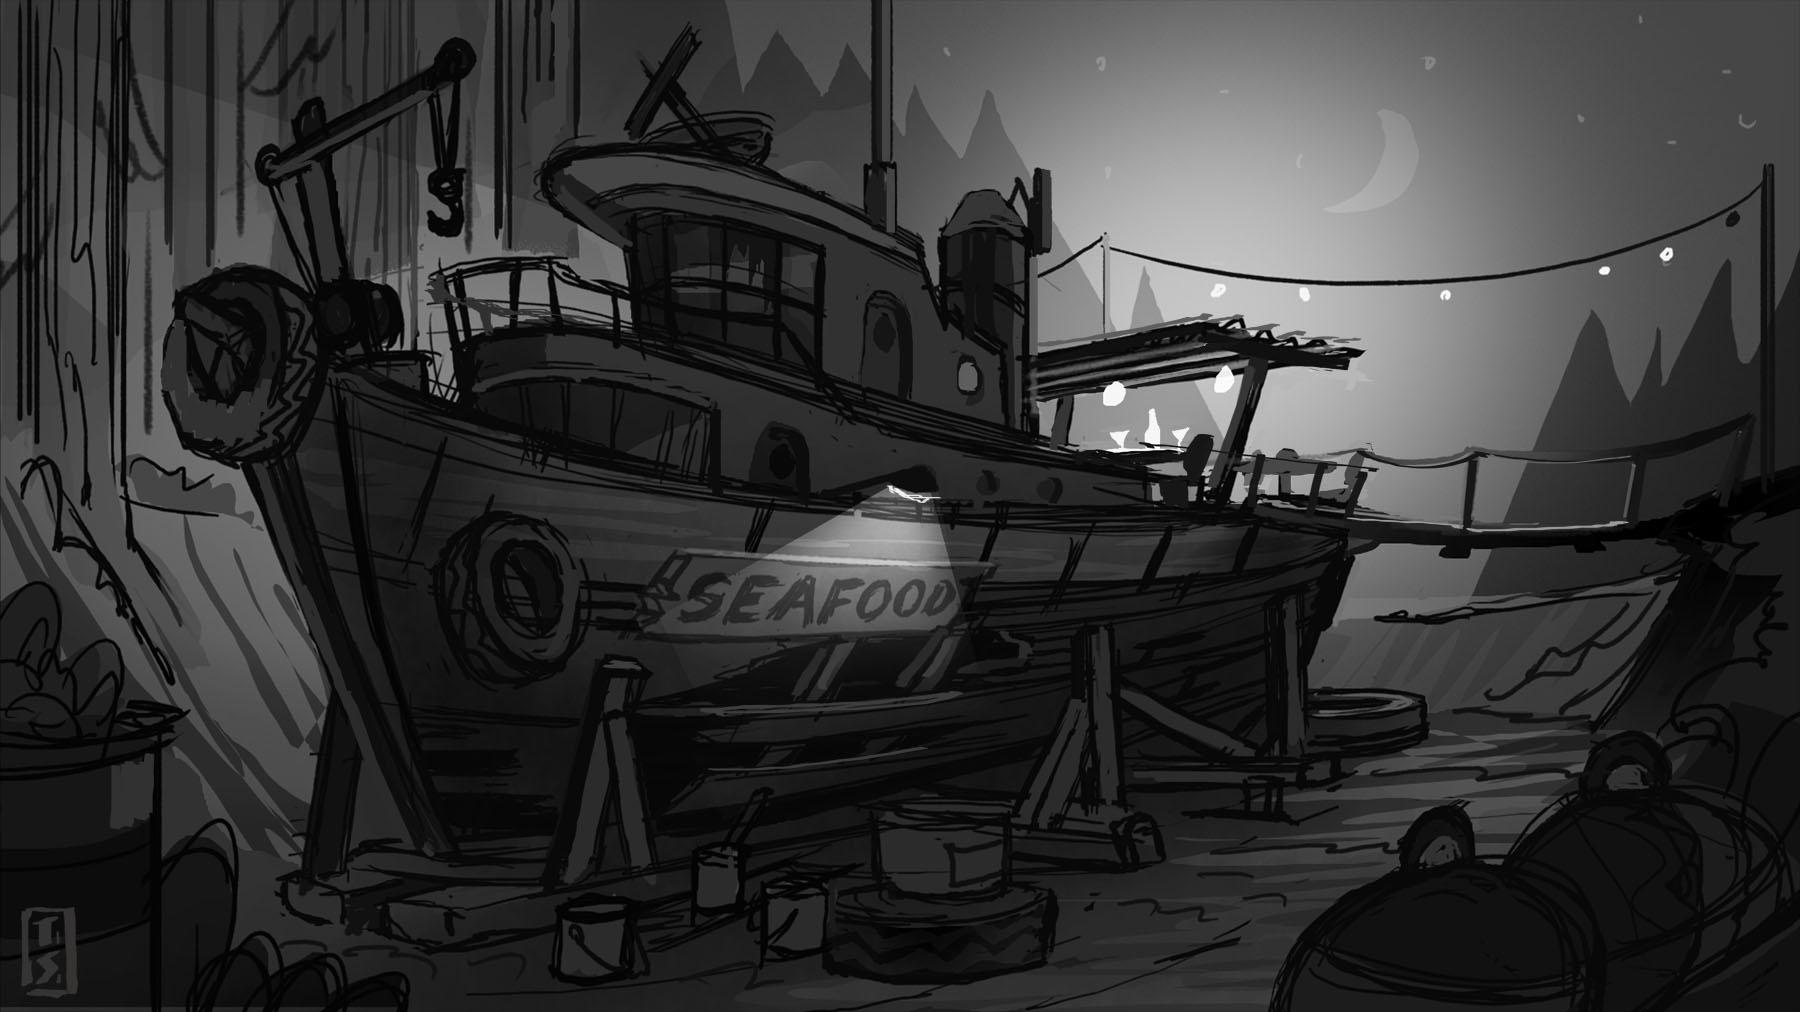 Seafood restaurant concept sketch